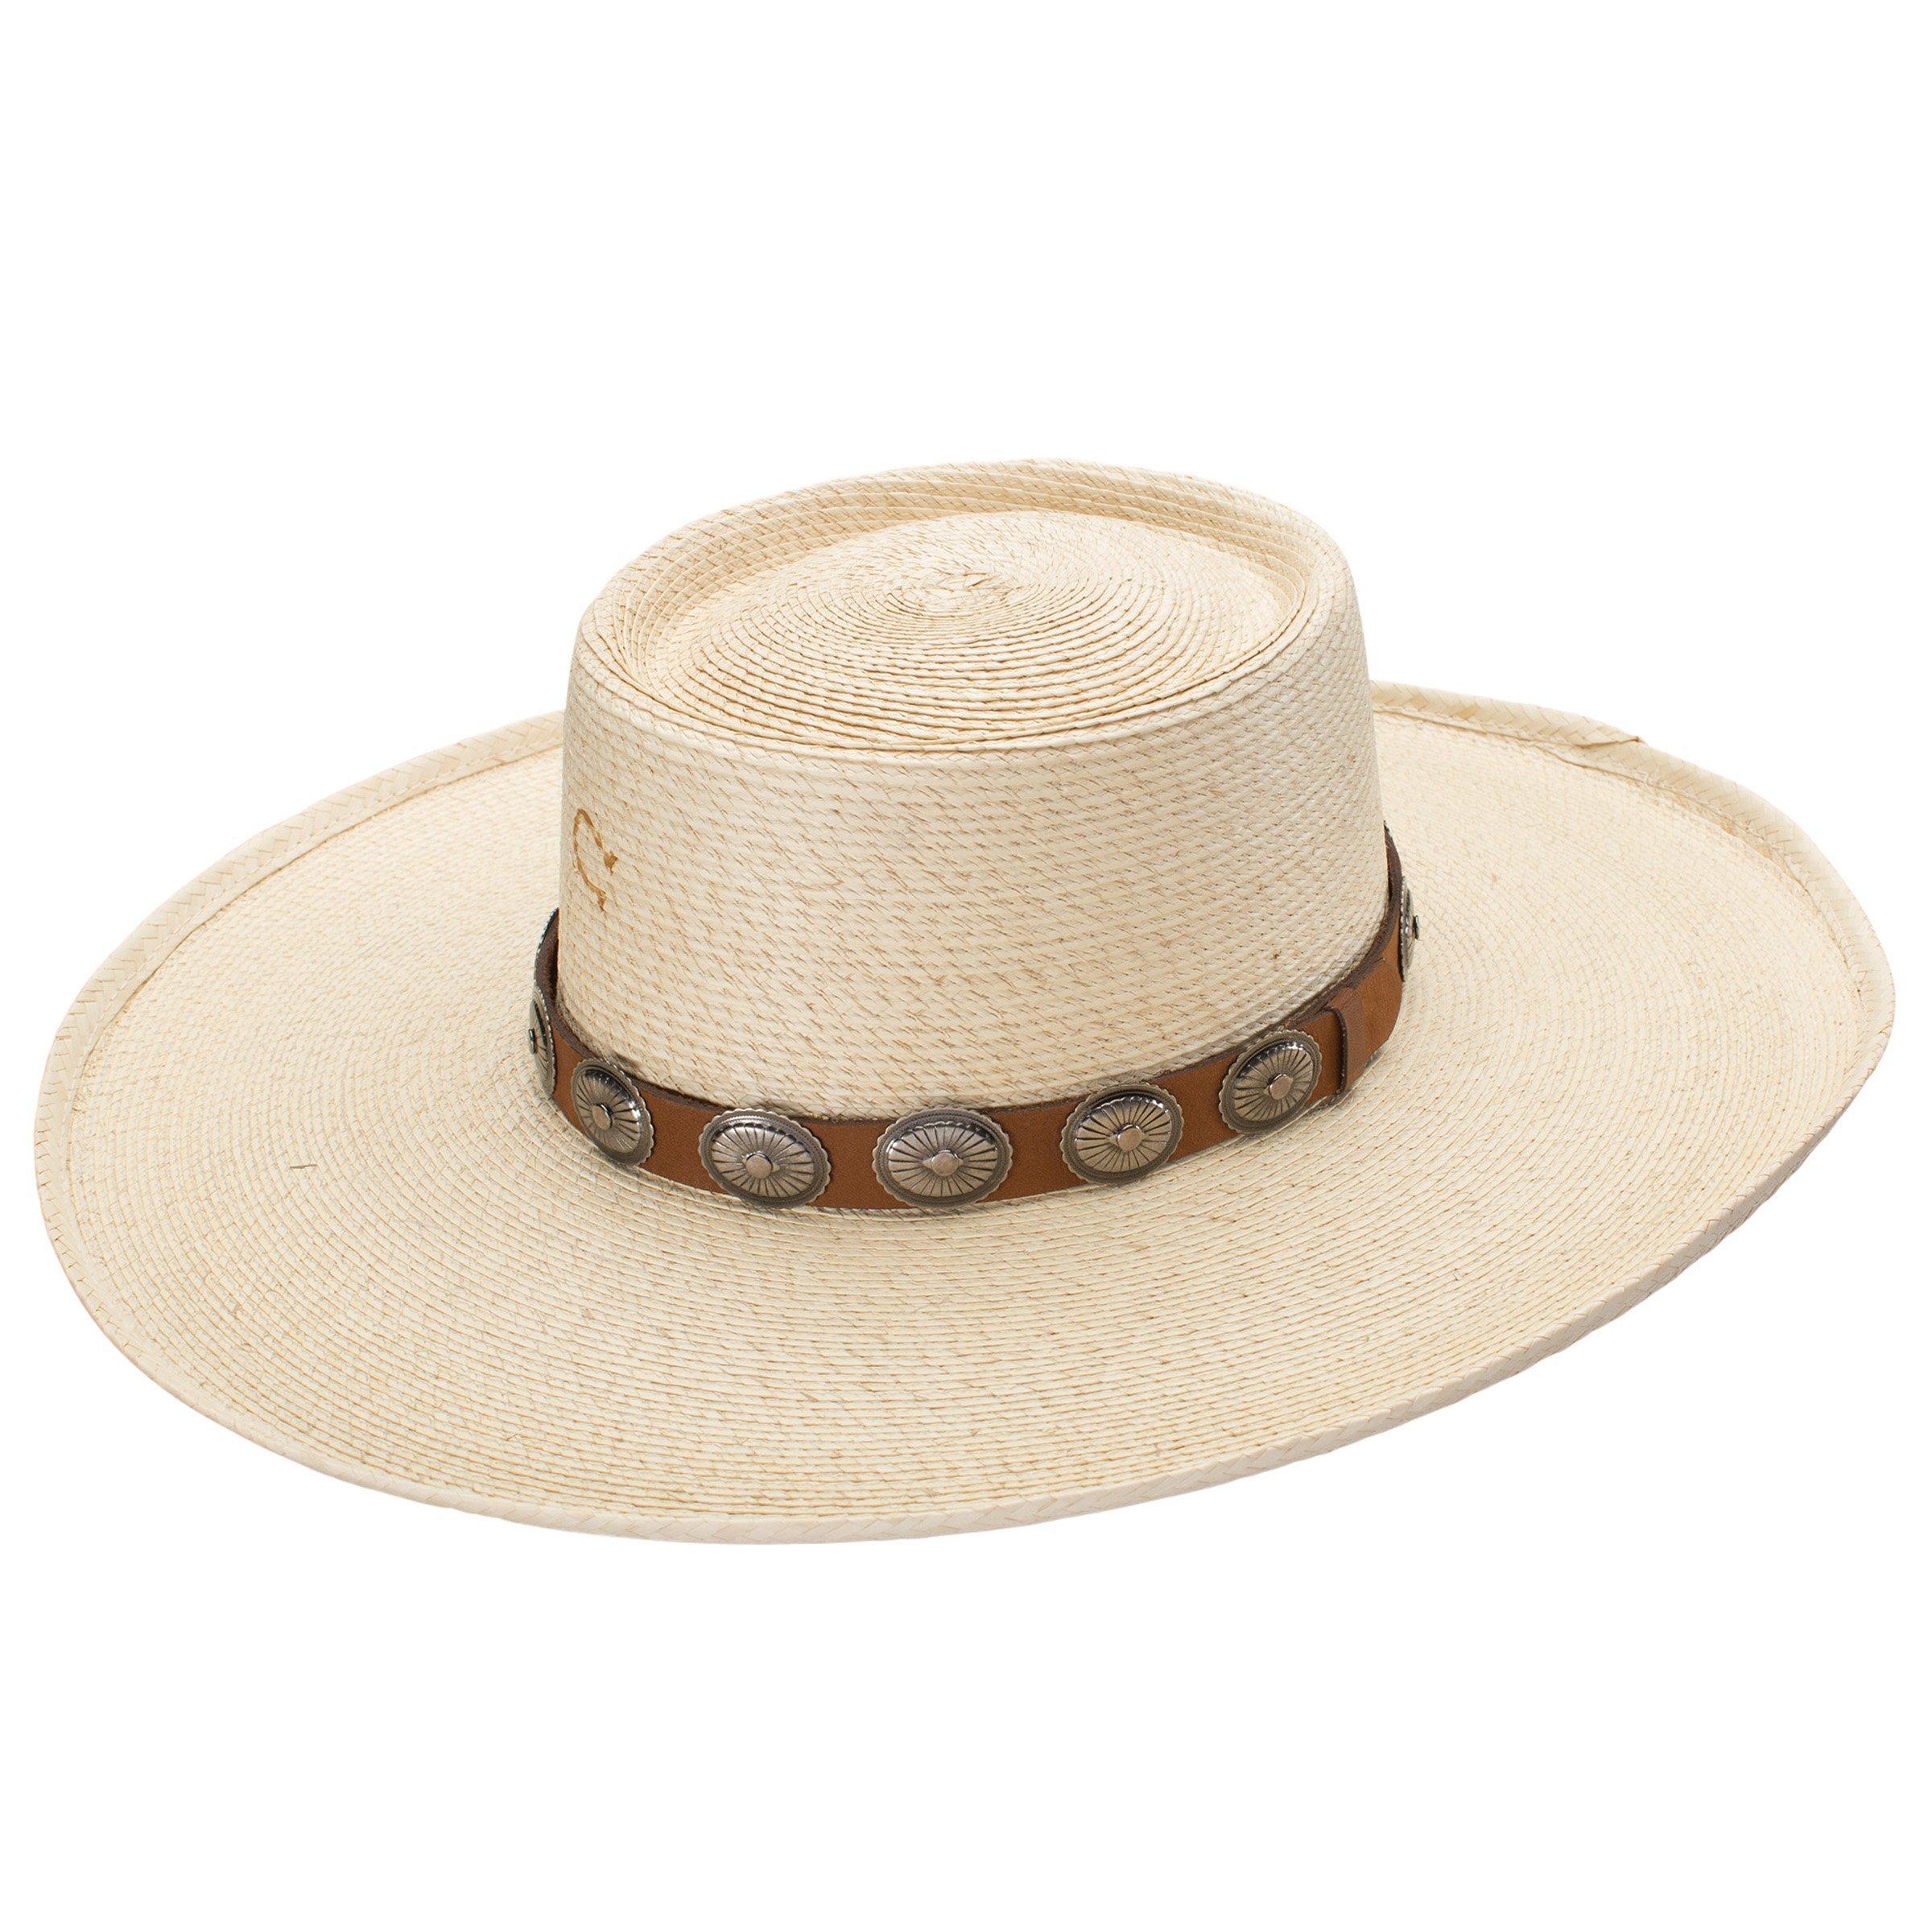 Charlie 1 Horse Women's High Desert Straw Hat Item CSHIDS-2550